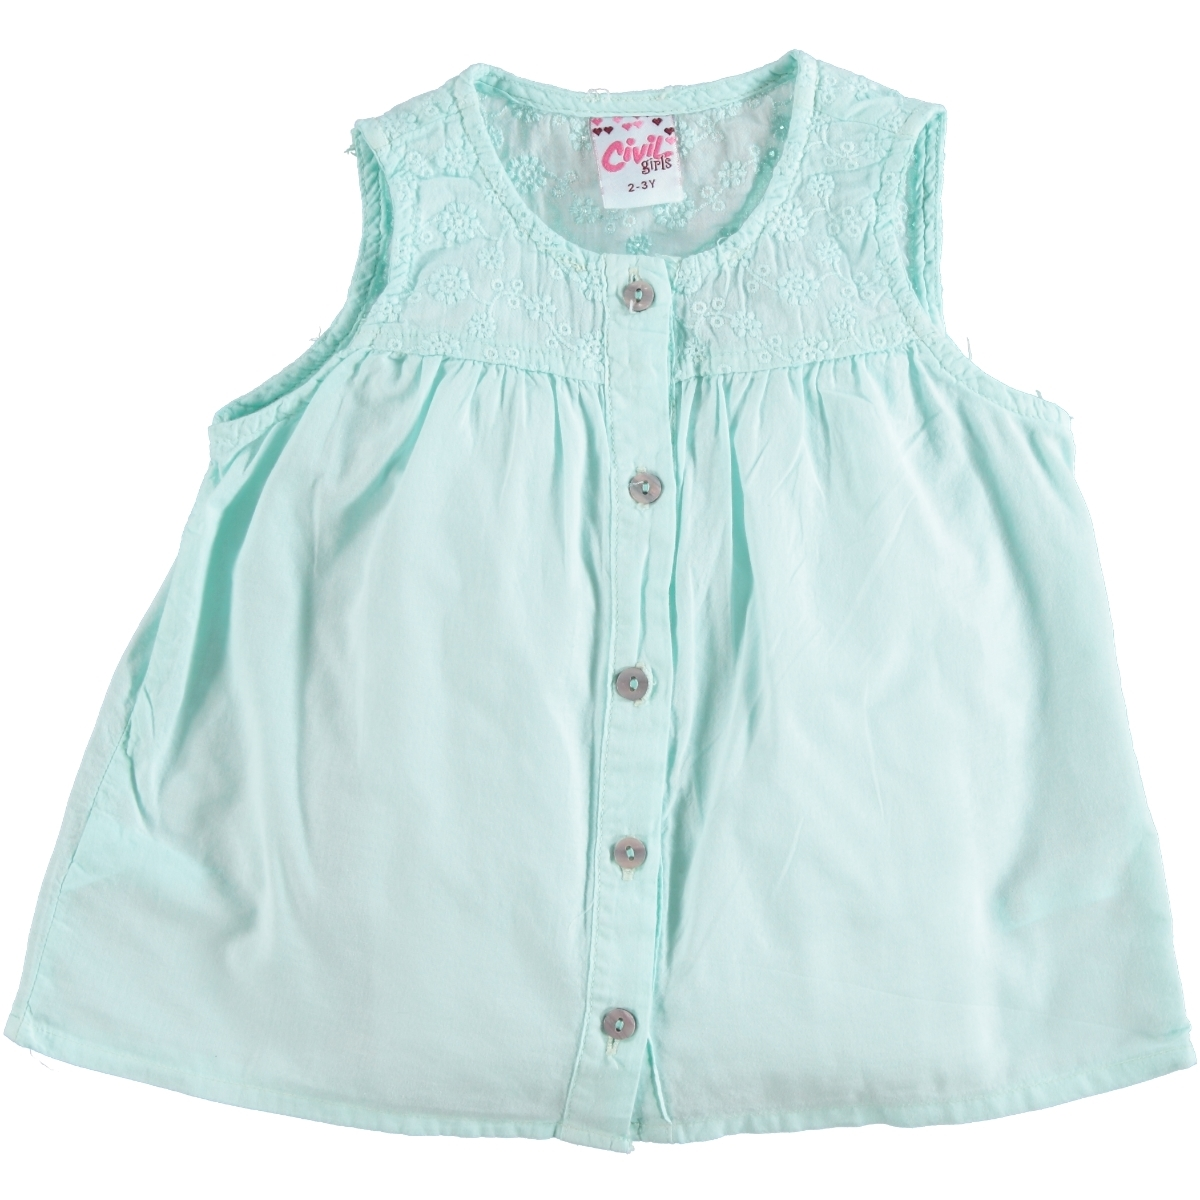 Civil Girls Mint Green Shirt Boy Girl Age 6-9